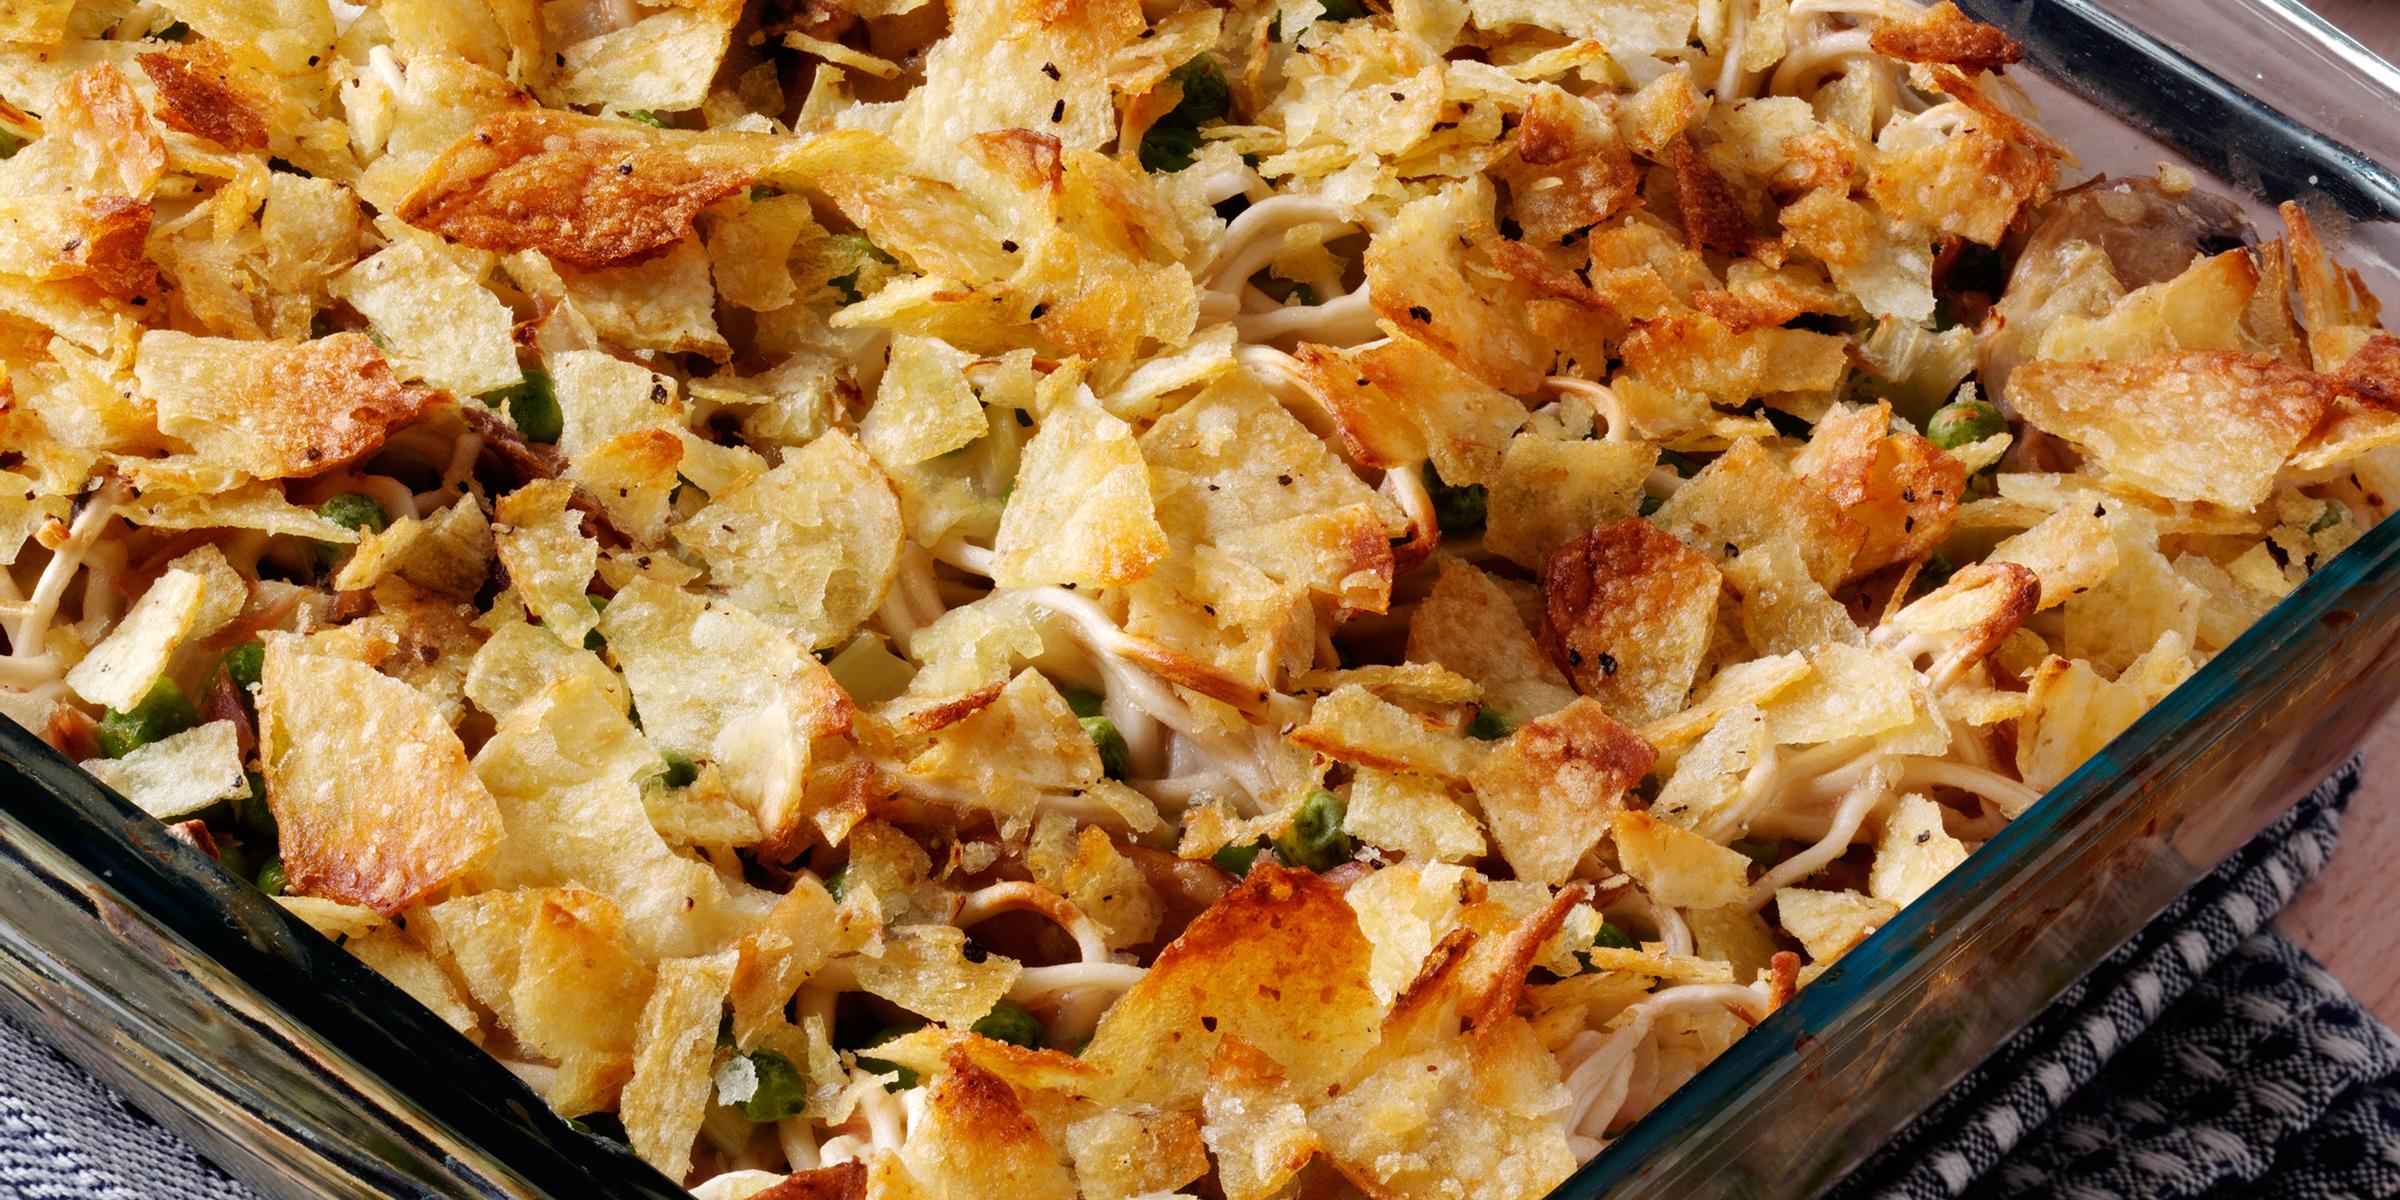 Valerie Bertinelli tops a classic tuna noodle casserole with potato chips